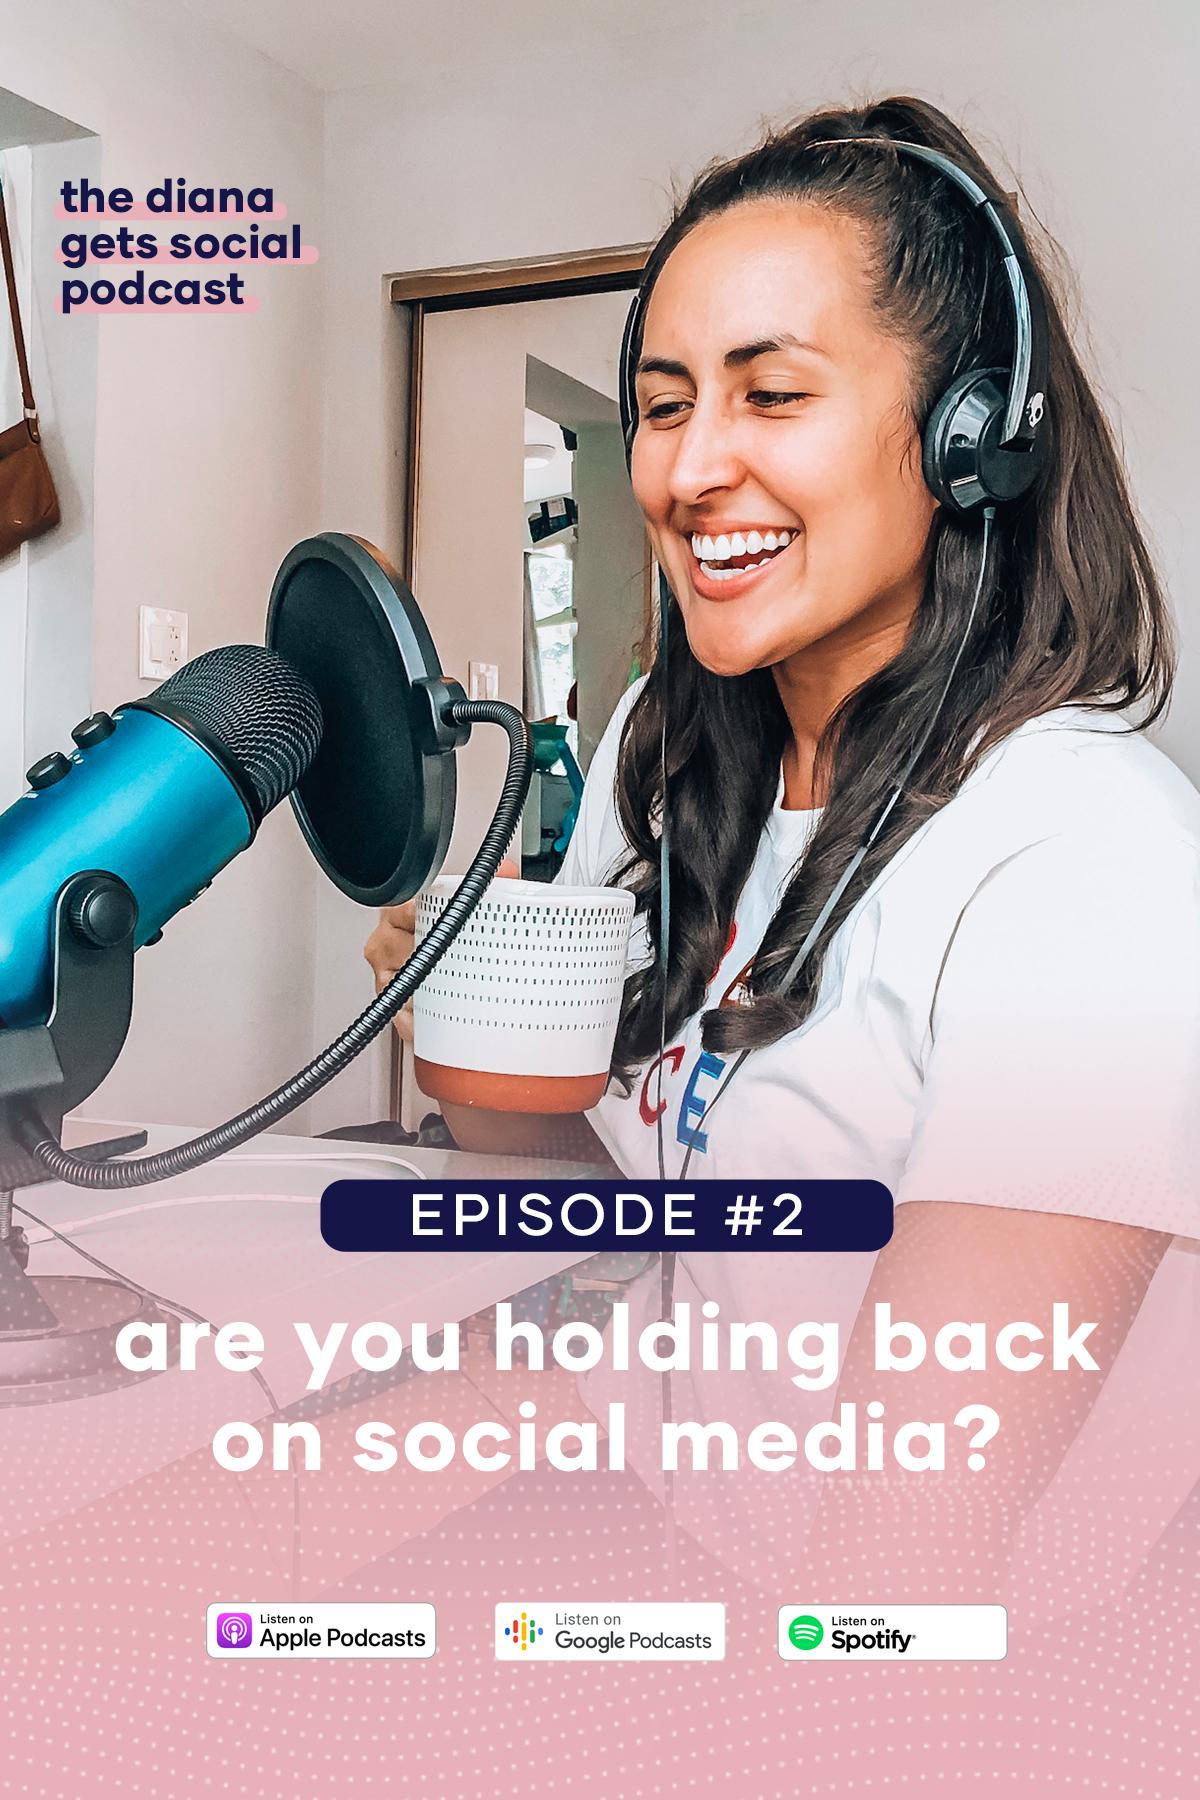 Diana Gets Social Podcast Episode 2.png